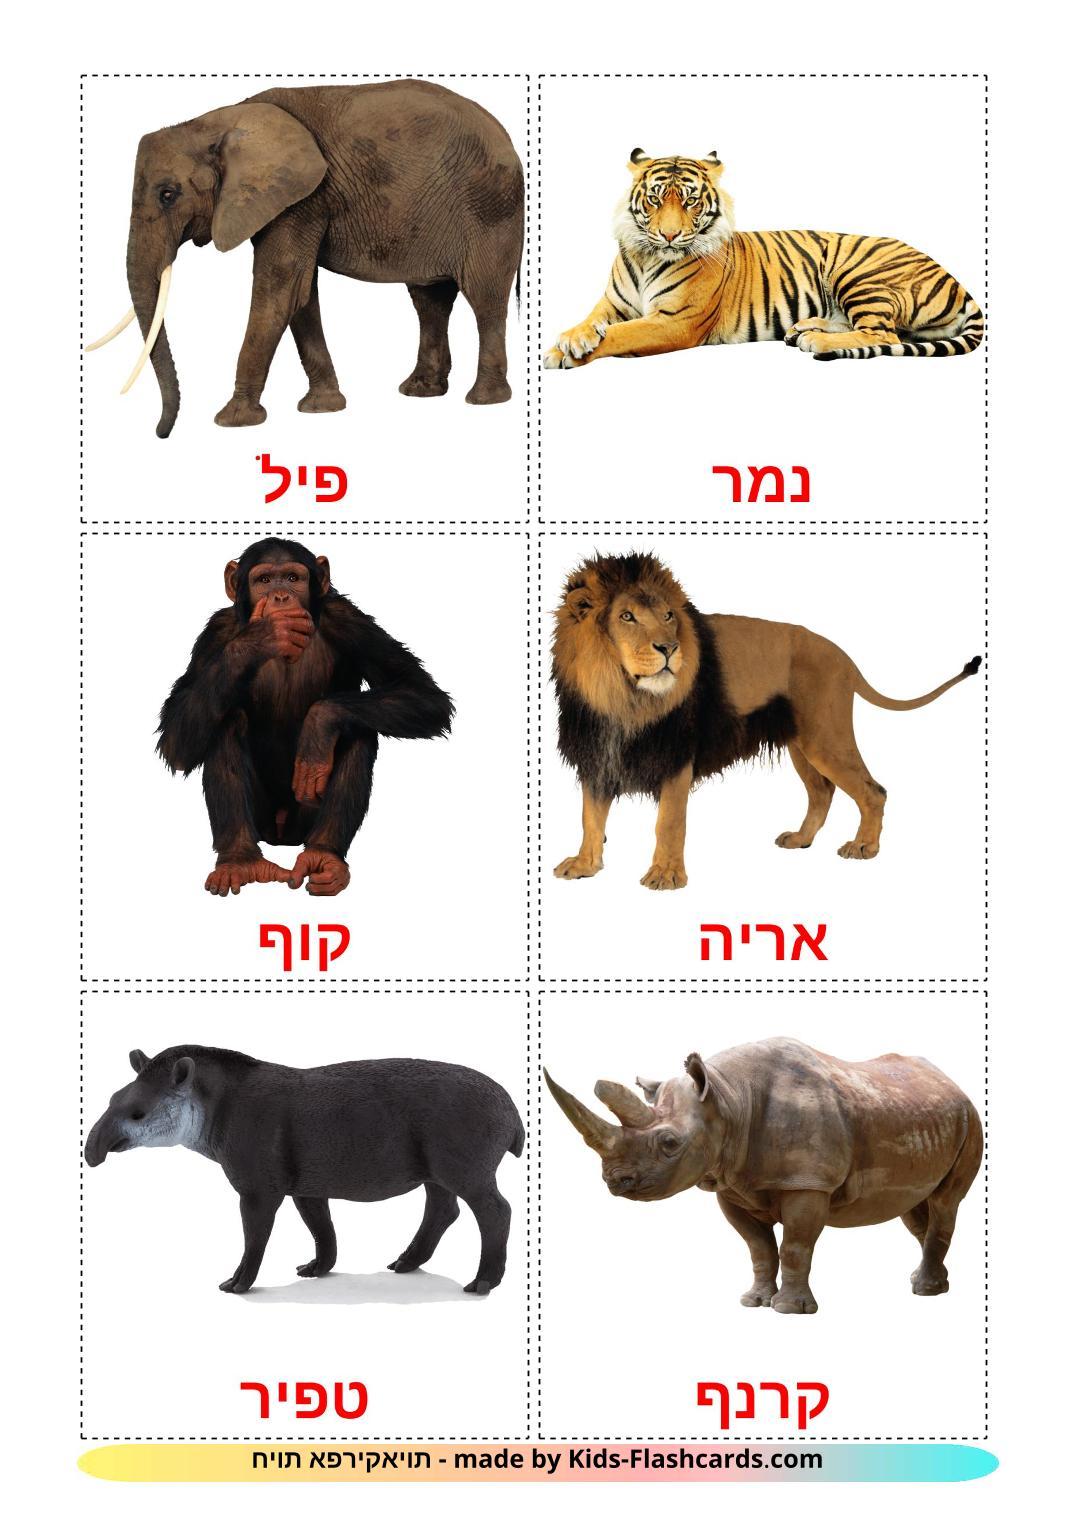 Jungle animals - 21 Free Printable hebrew Flashcards